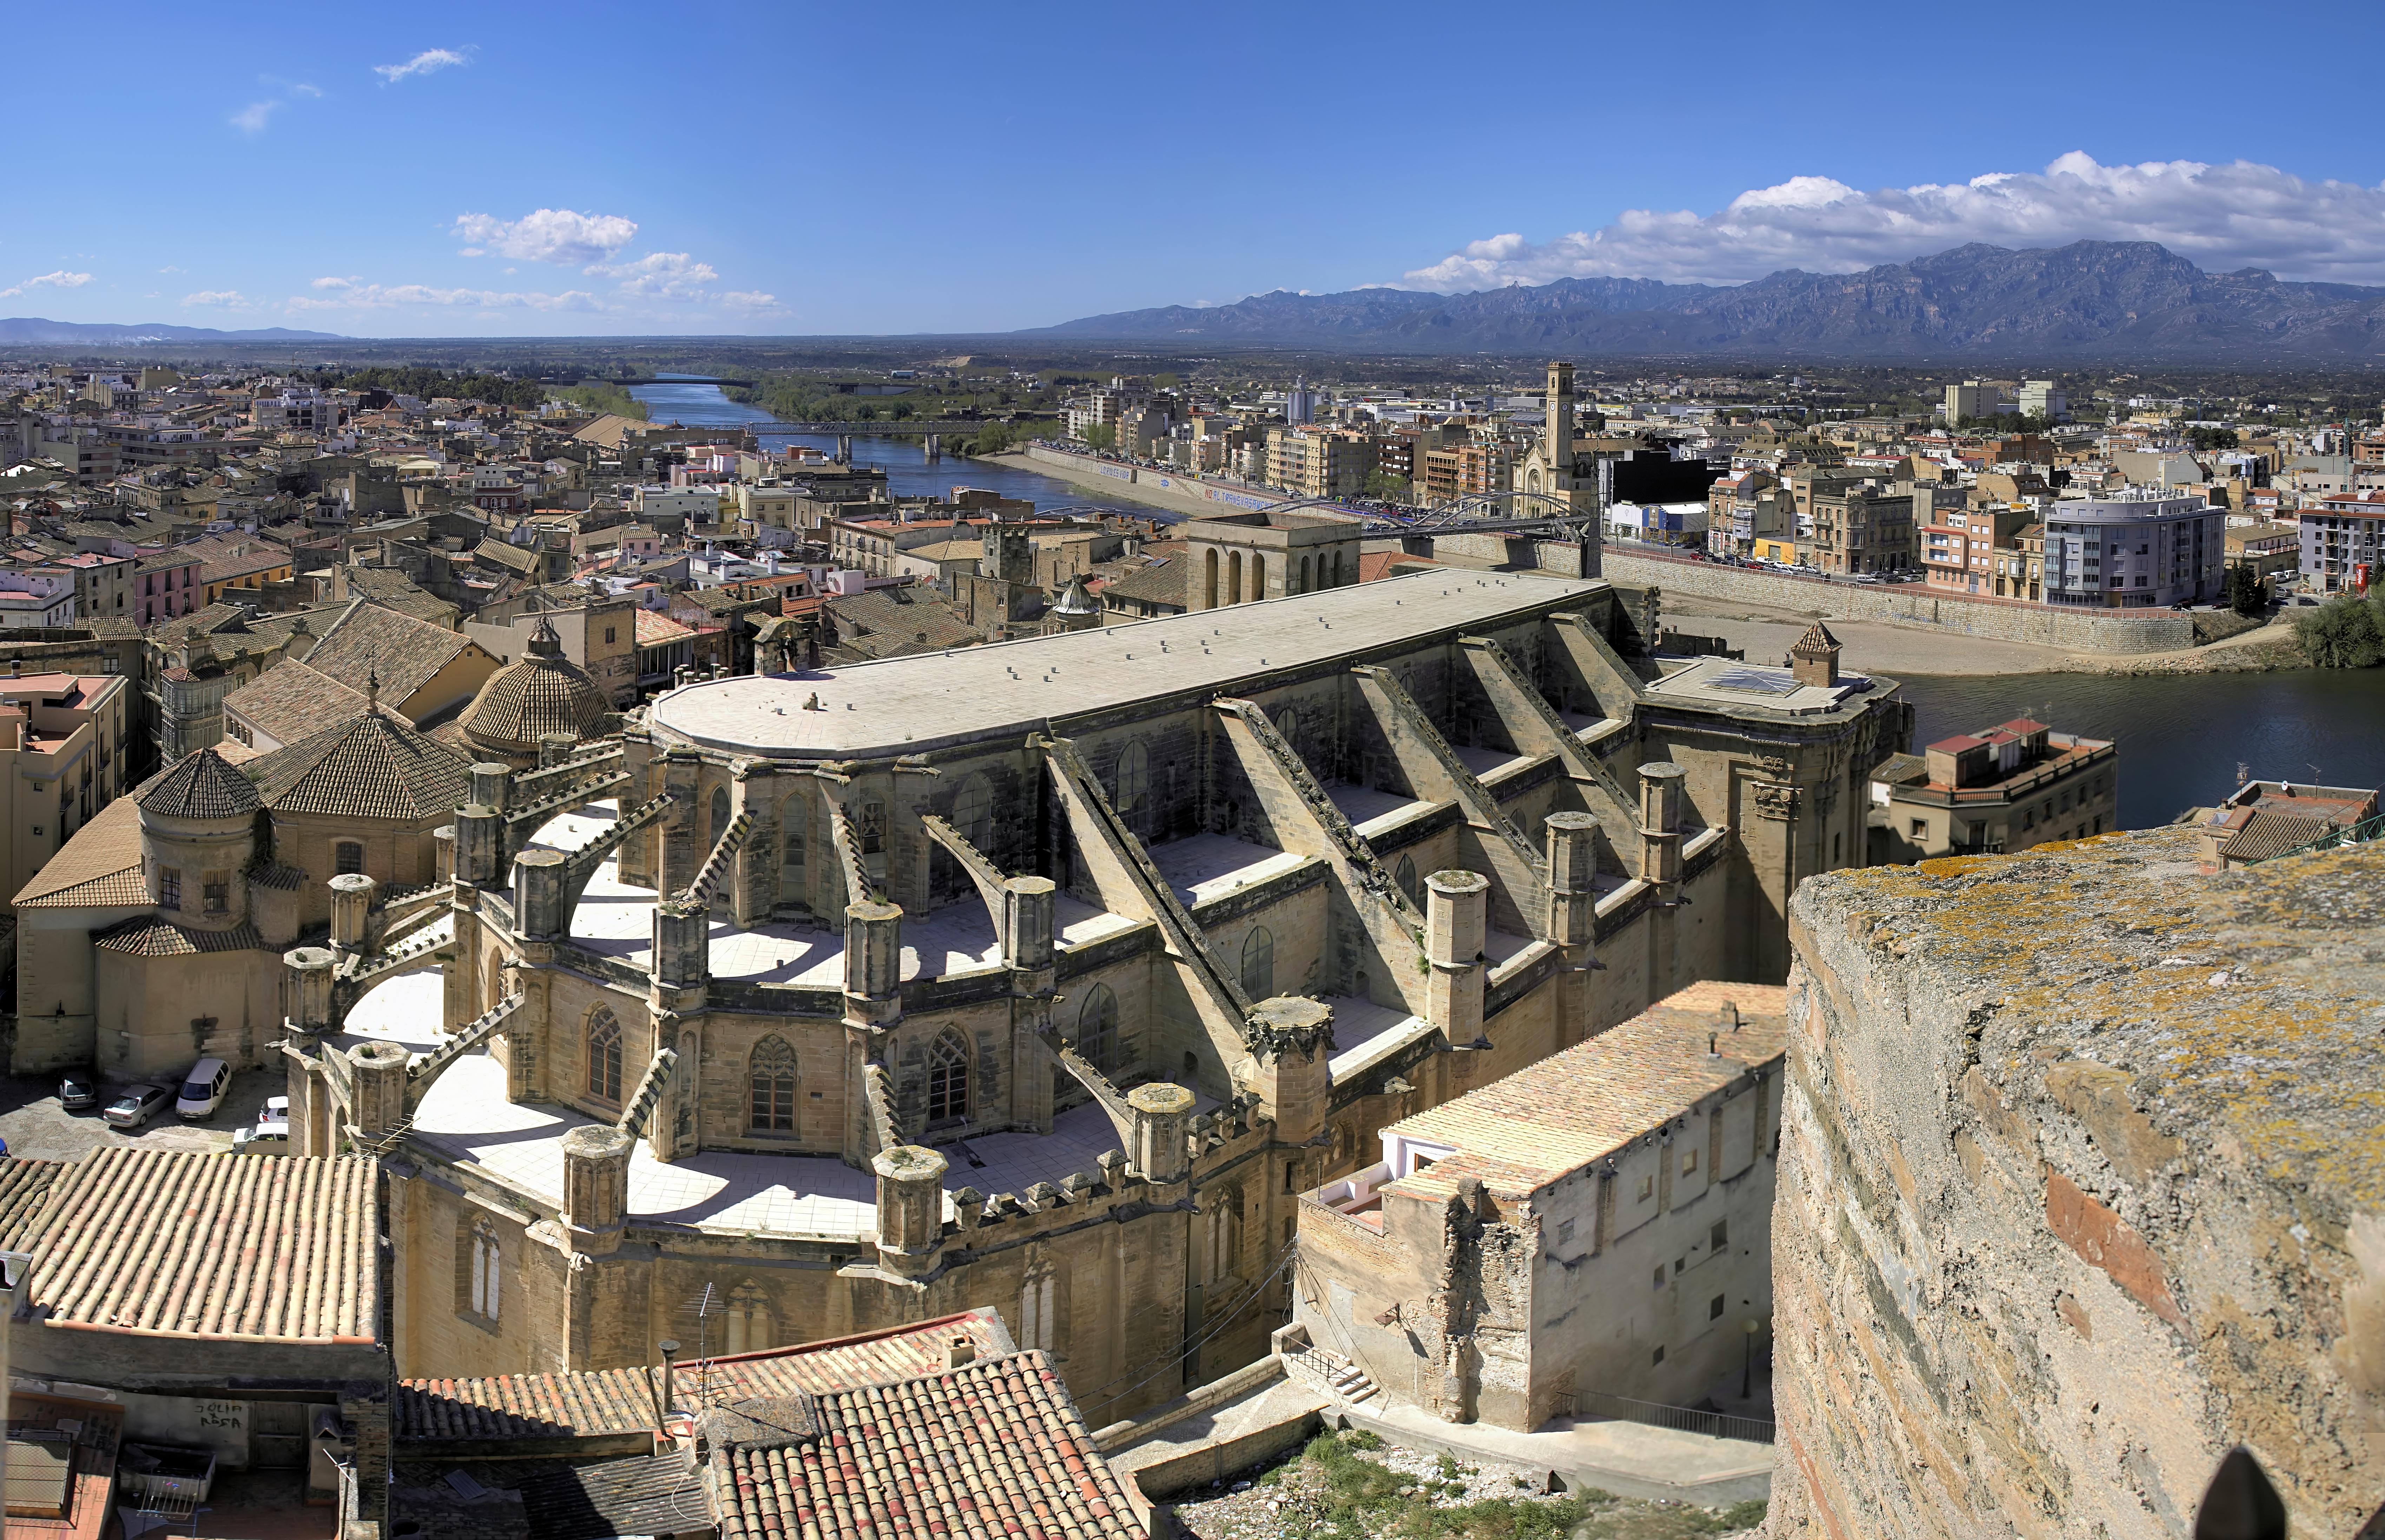 Tortosa Spain  city images : Tortosa town view Wikipedia, the free encyclopedia